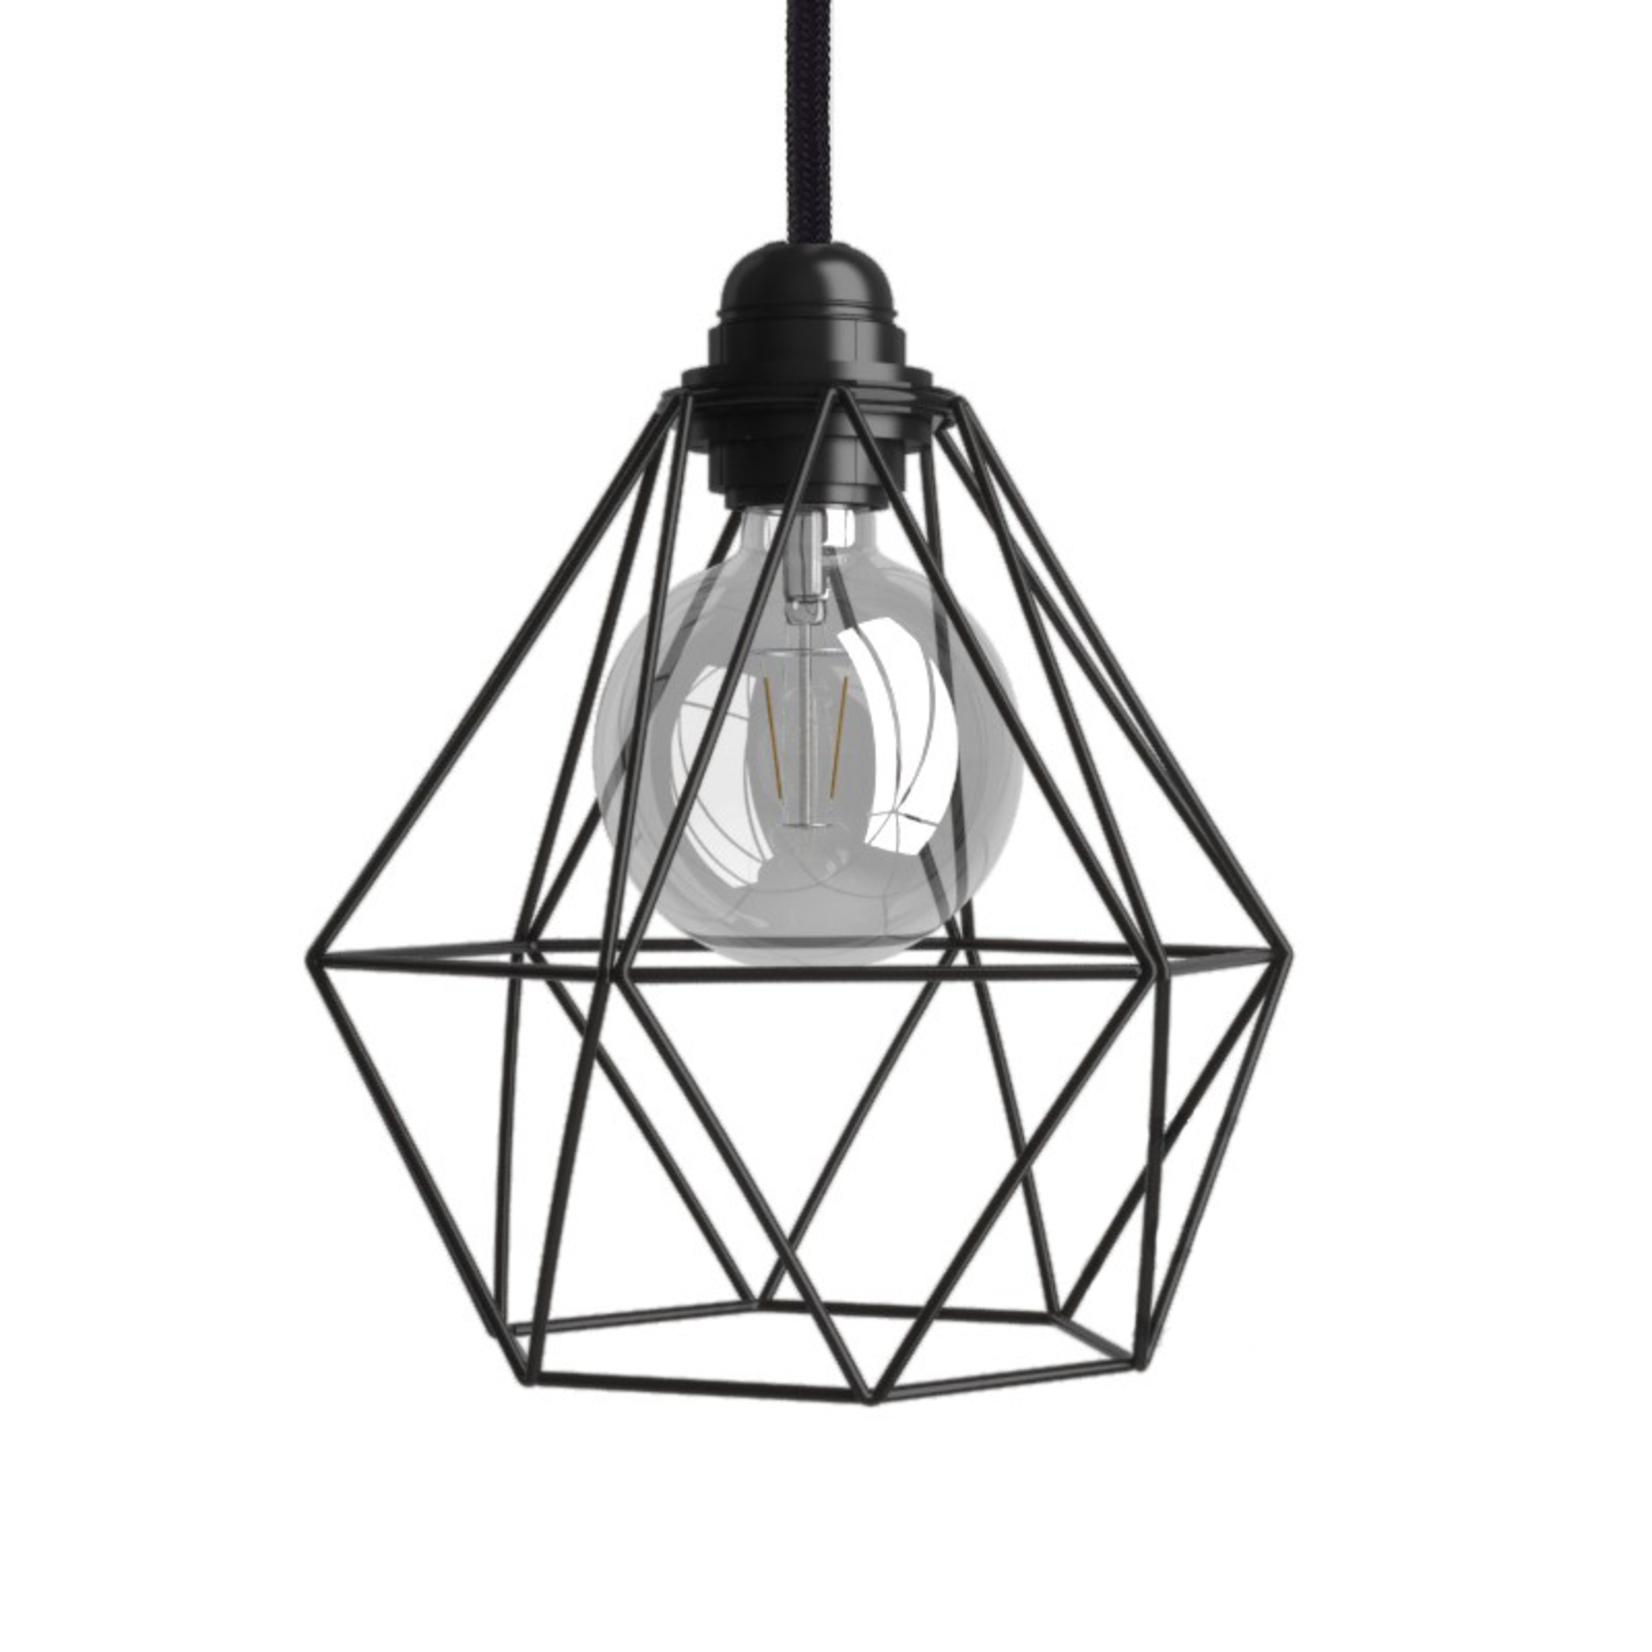 CCIT Black Wire cage lampshade Diamond shape